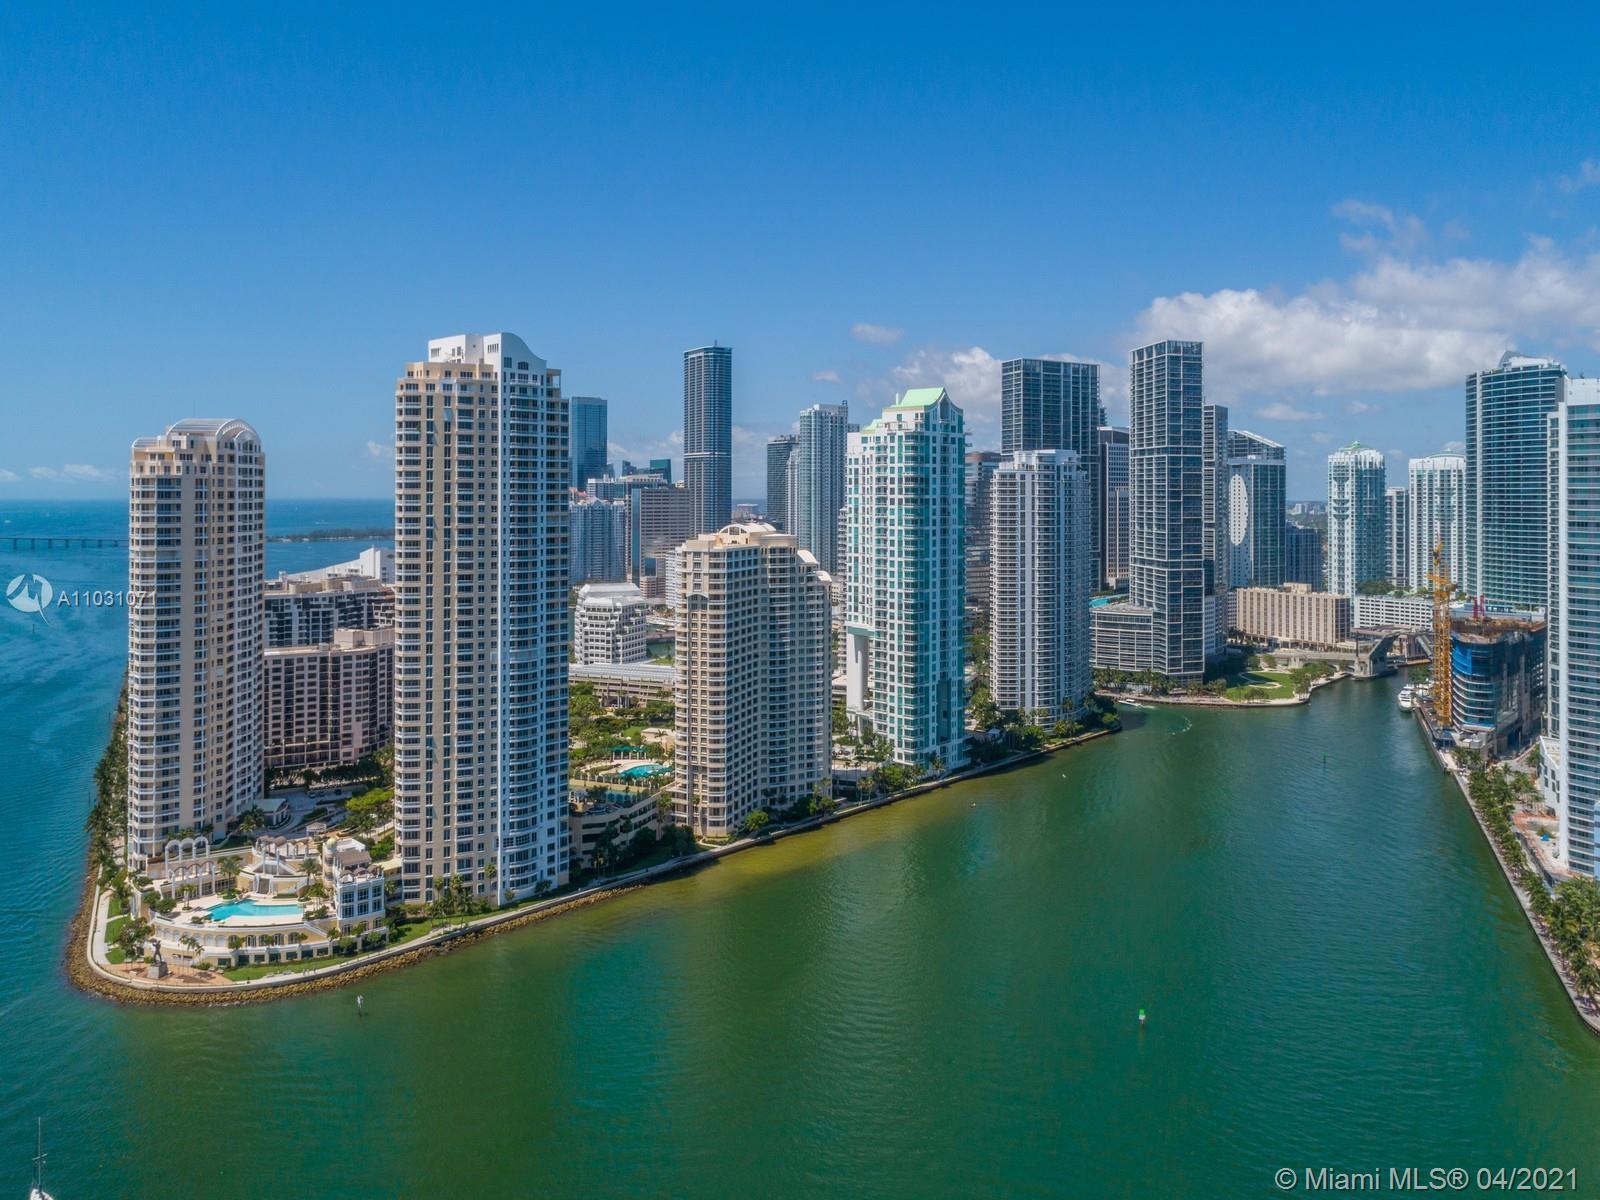 Asia #2903 - 900 Brickell Key Blvd #2903, Miami, FL 33131